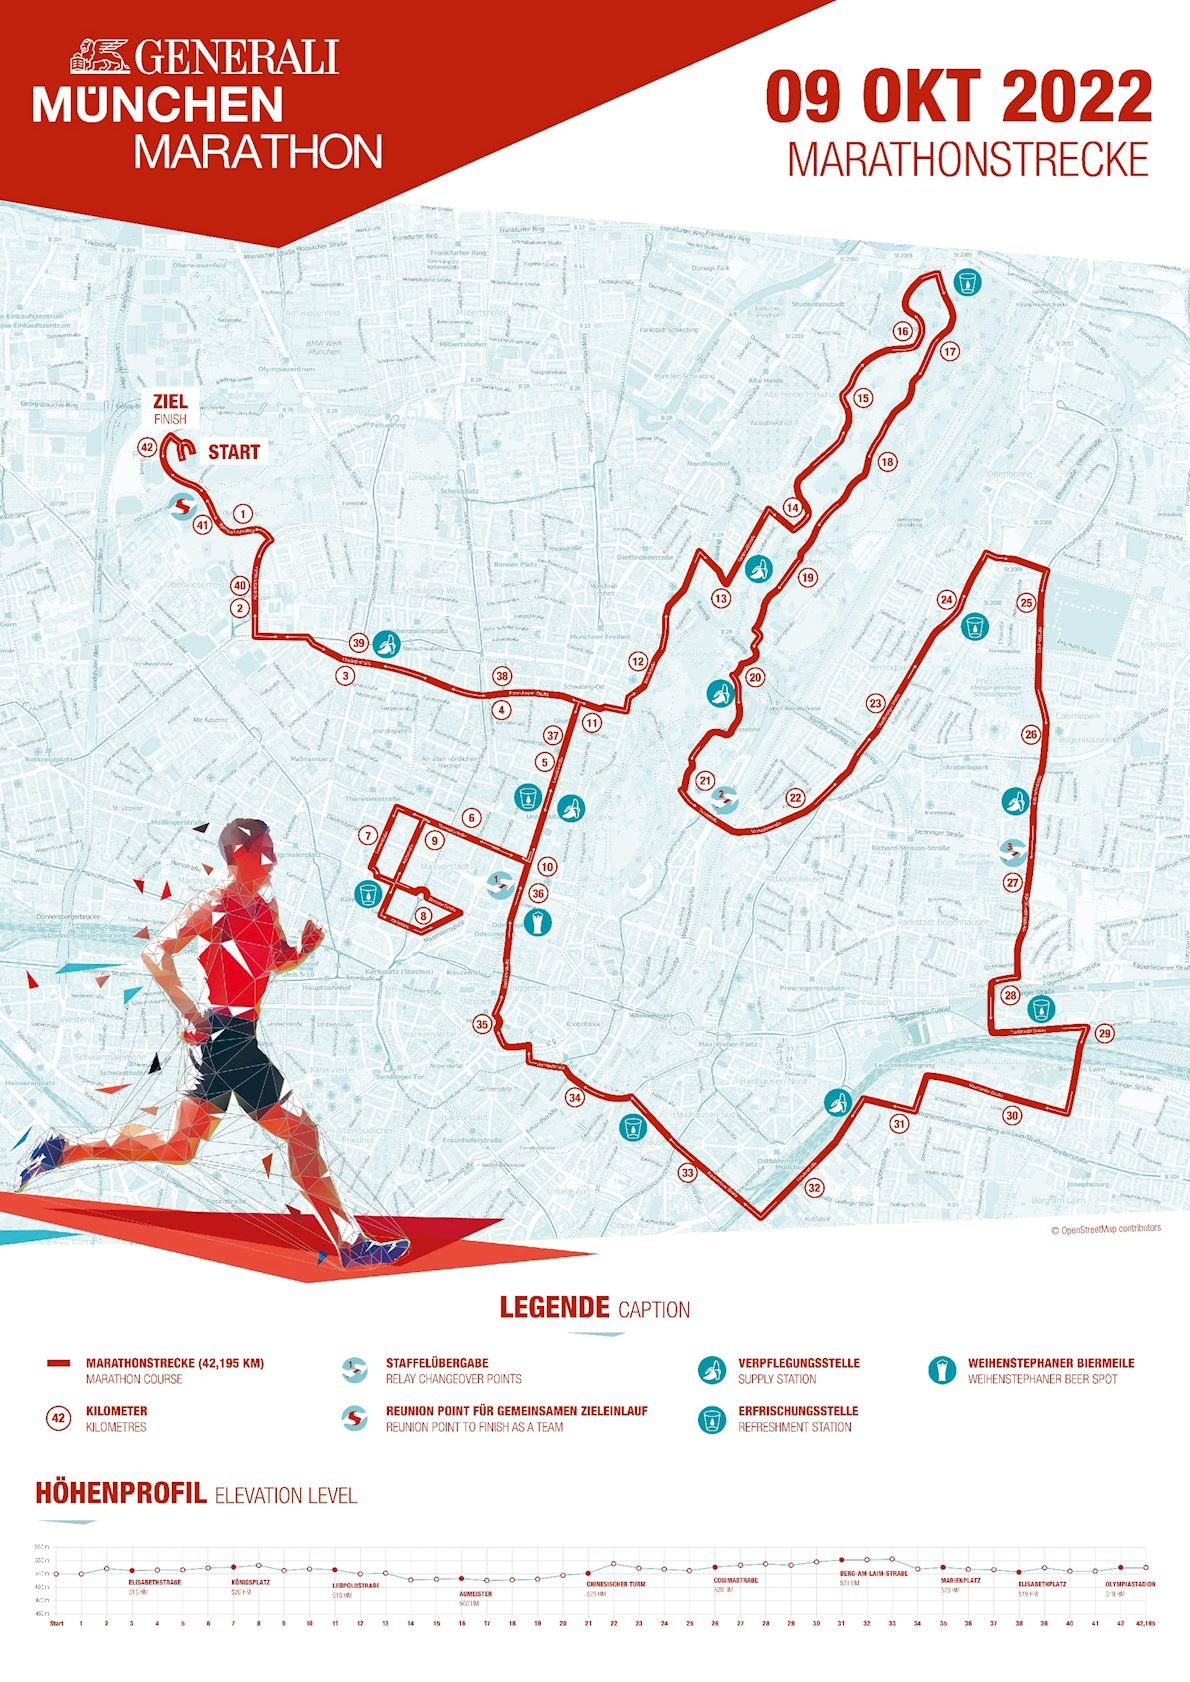 Generali München Marathon Routenkarte